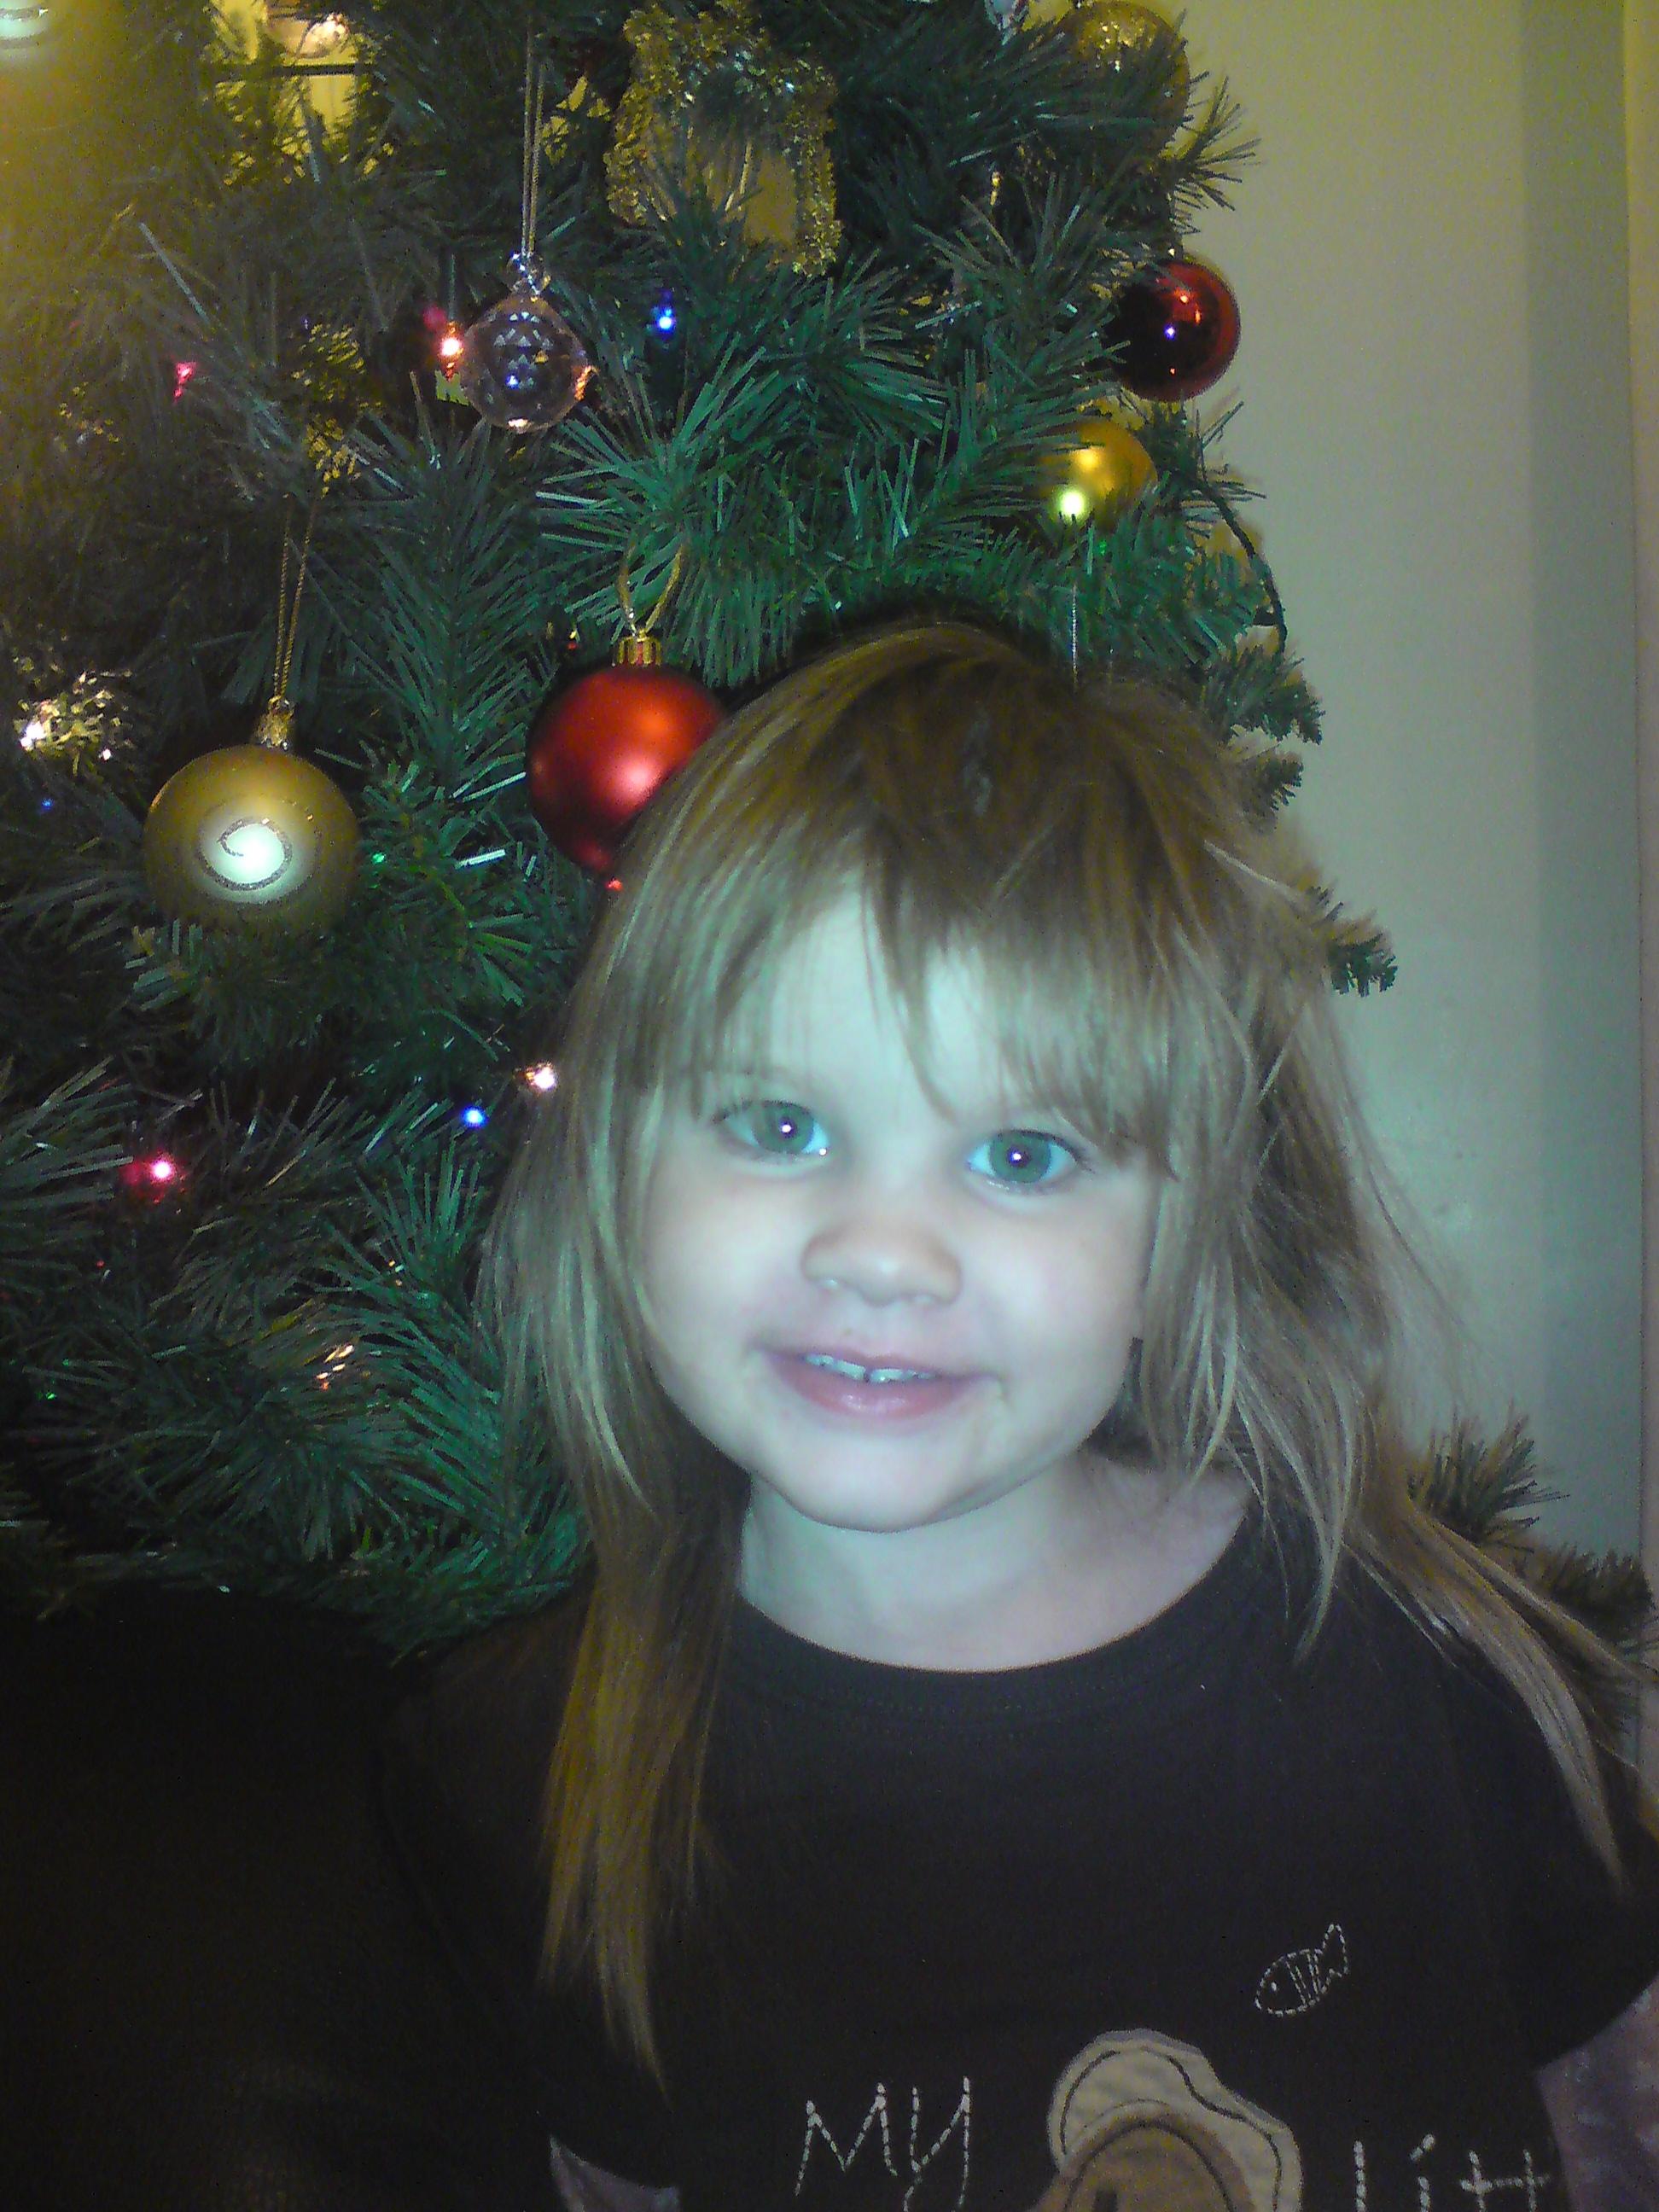 Bonnie Loves The Christmas Tree